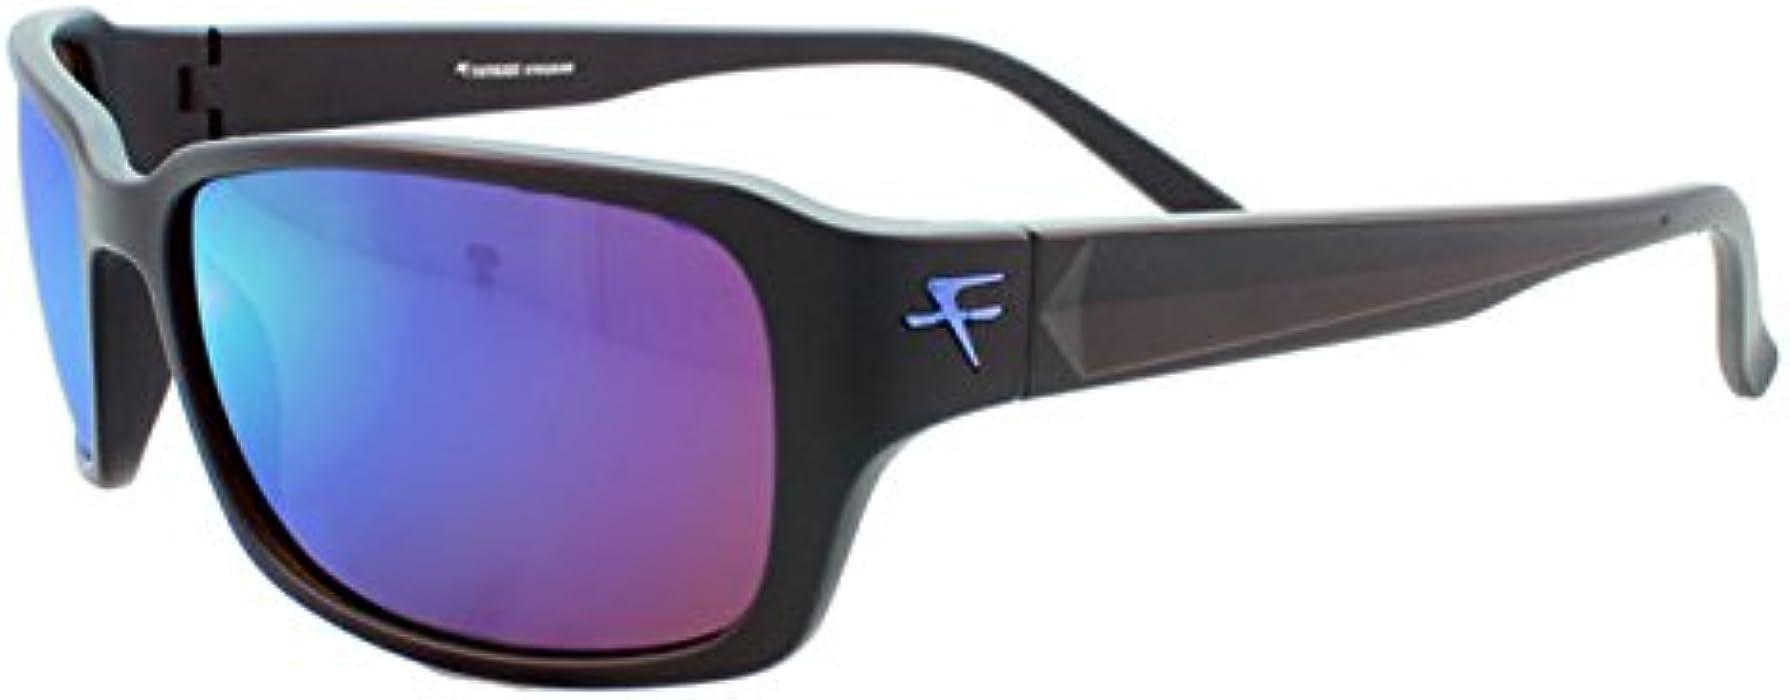 f85f211f52 Fatheadz Eyewear Men s Jaxon V2.0 FH-V124-1BL Polarized Rectangular  Sunglasses